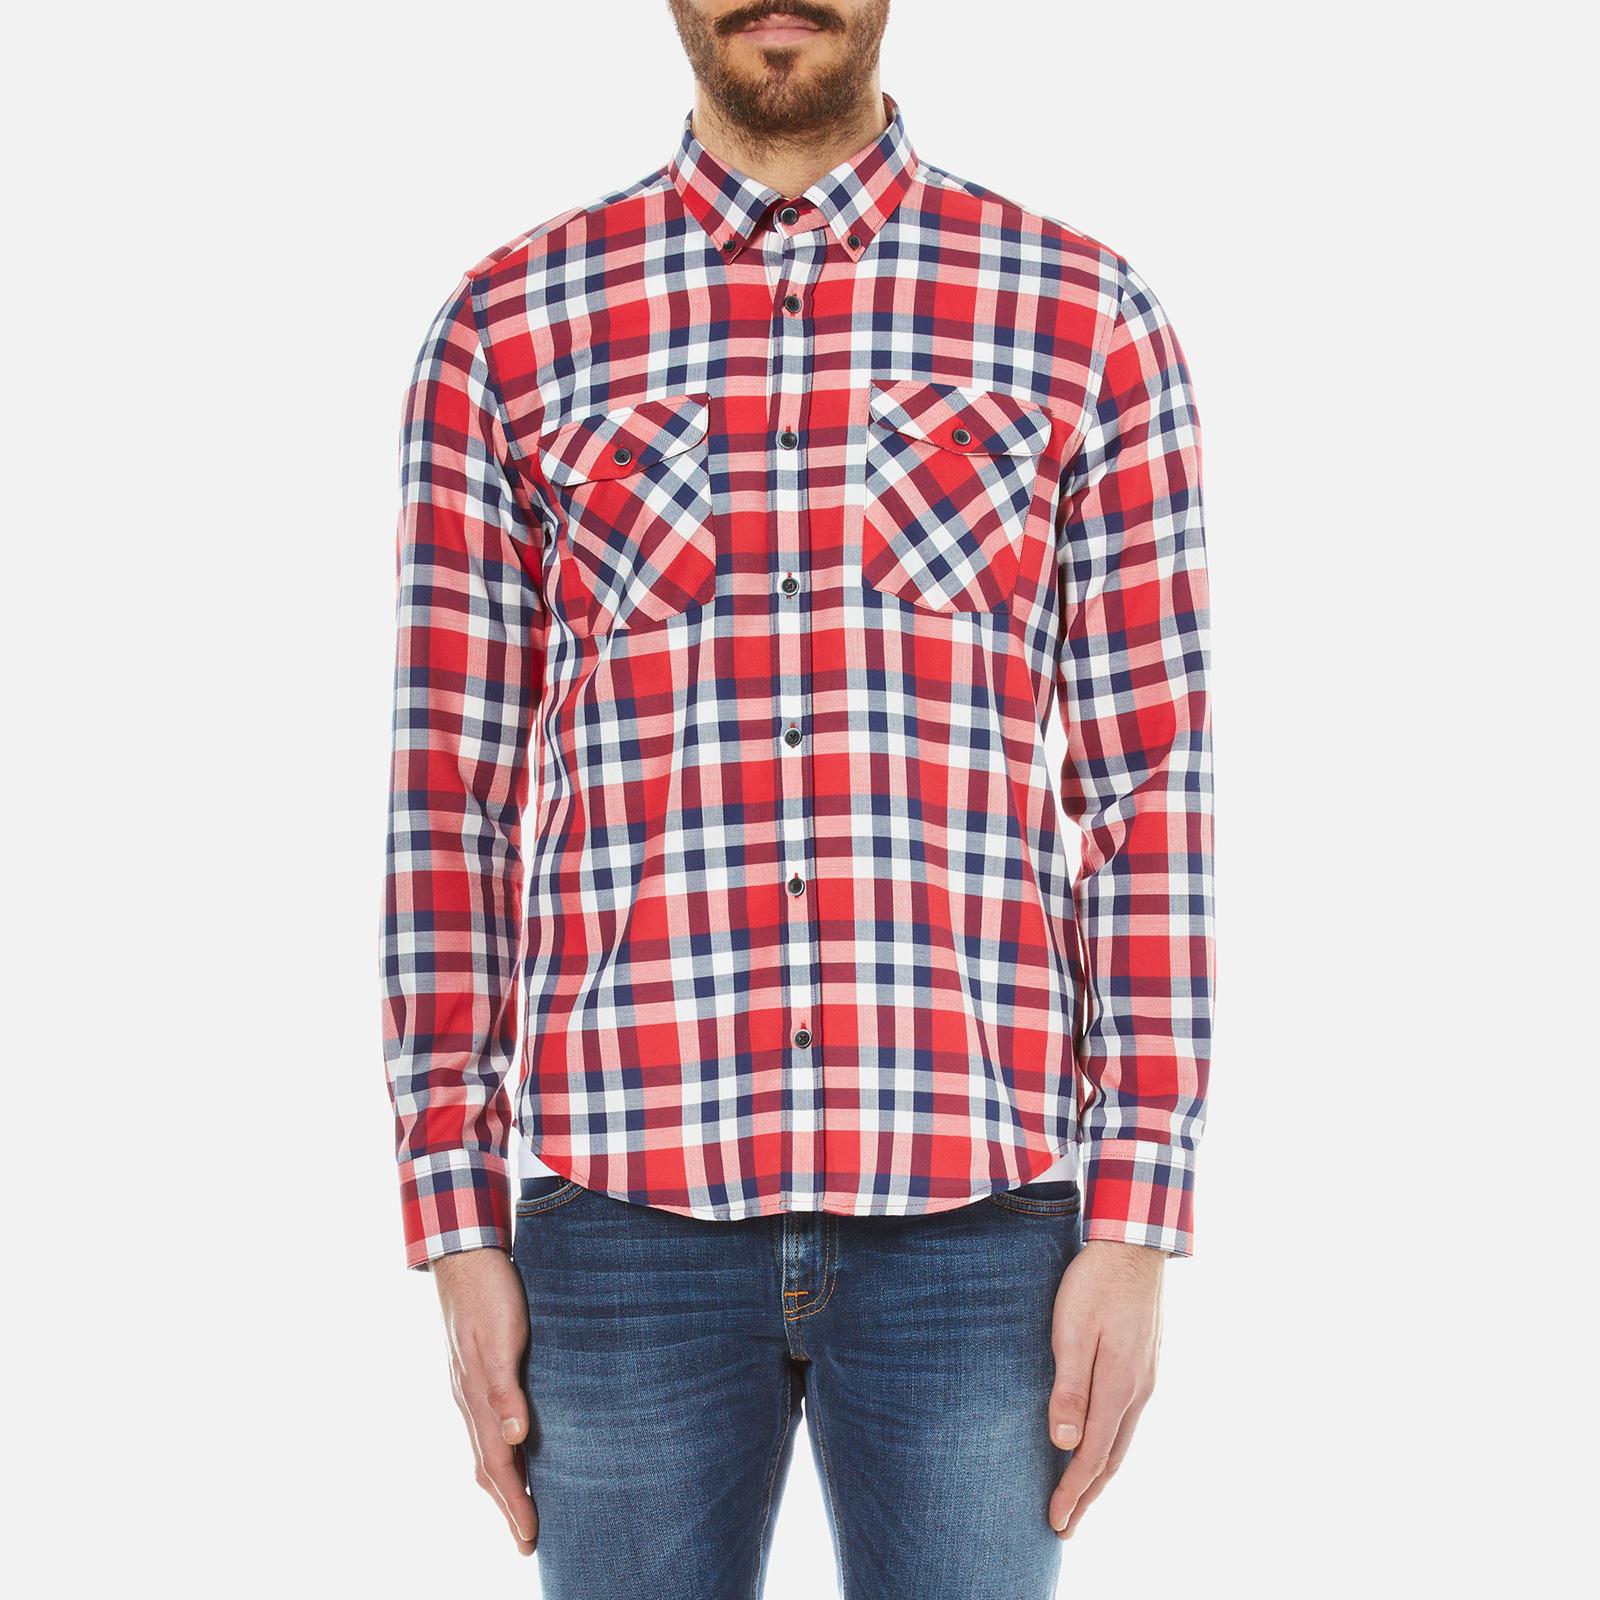 62188198 Barbour X Steve McQueen Men's Rebel Shirt - Red - Free UK Delivery over £50